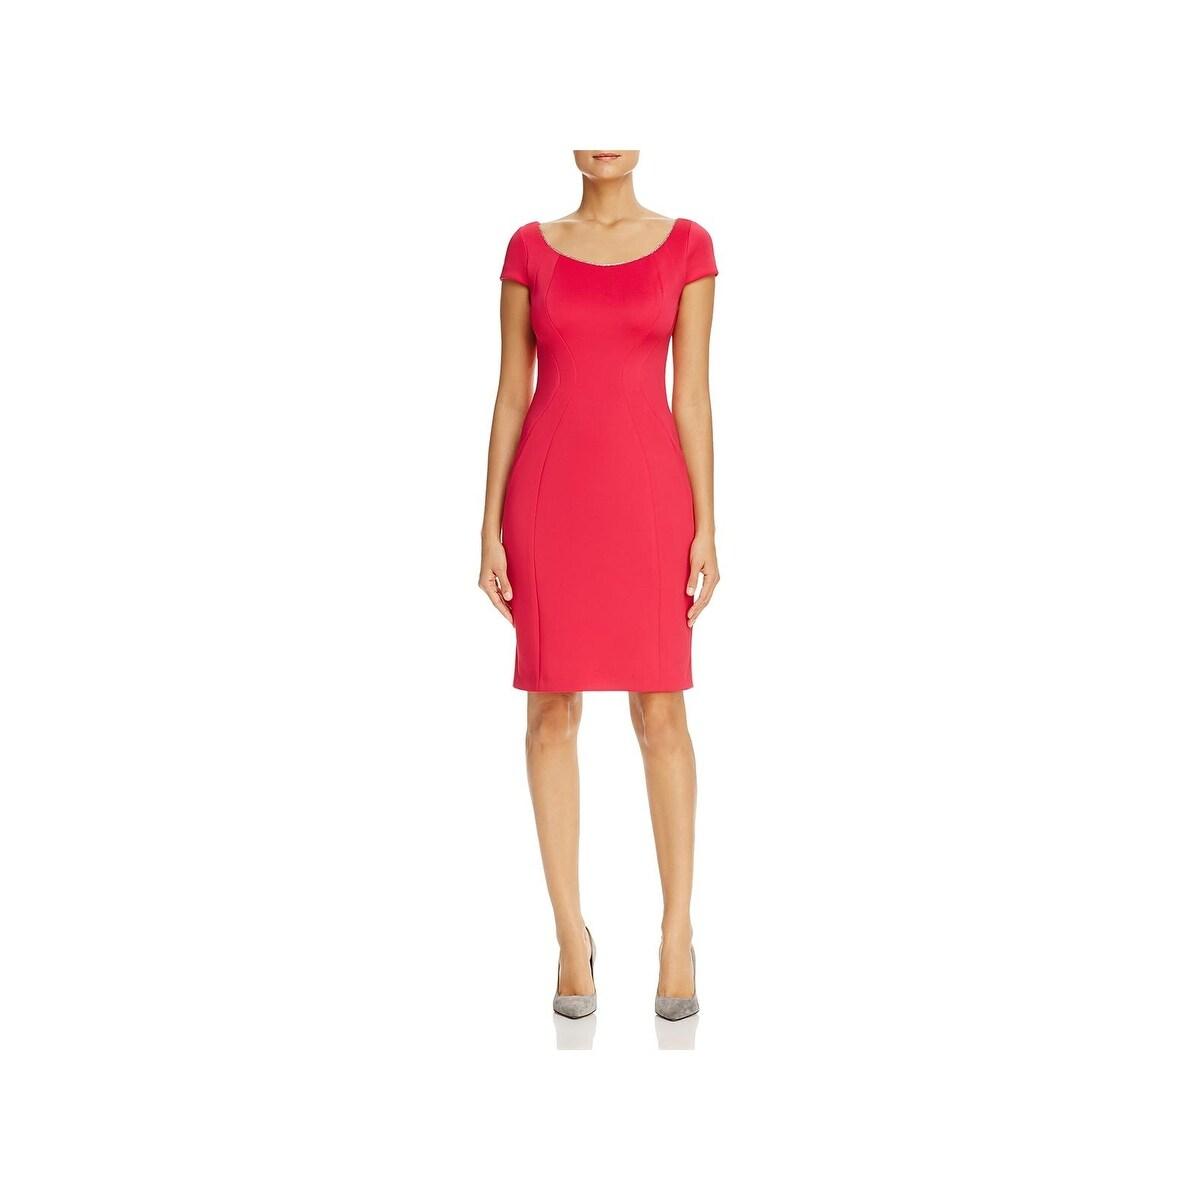 6861415508 T Tahari Dresses